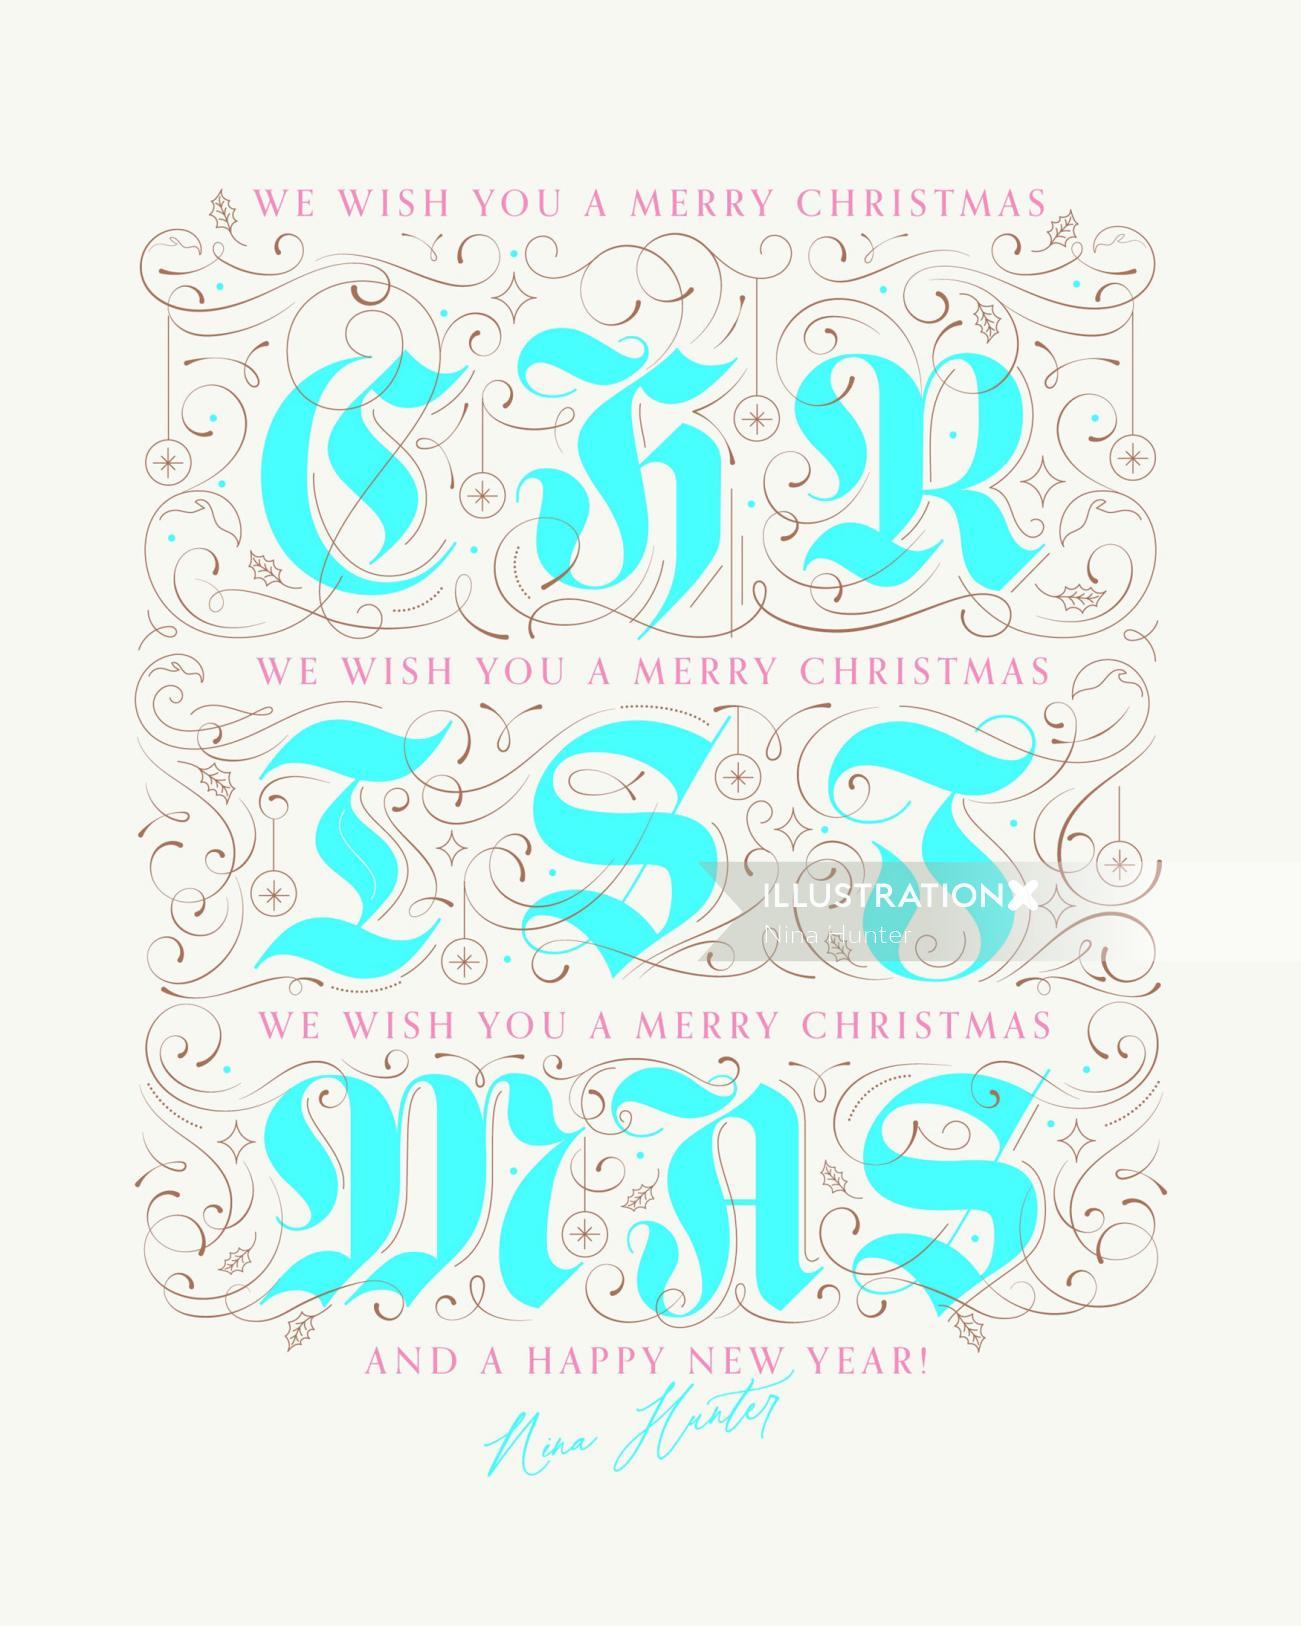 Typographic art of Christmas Wishes